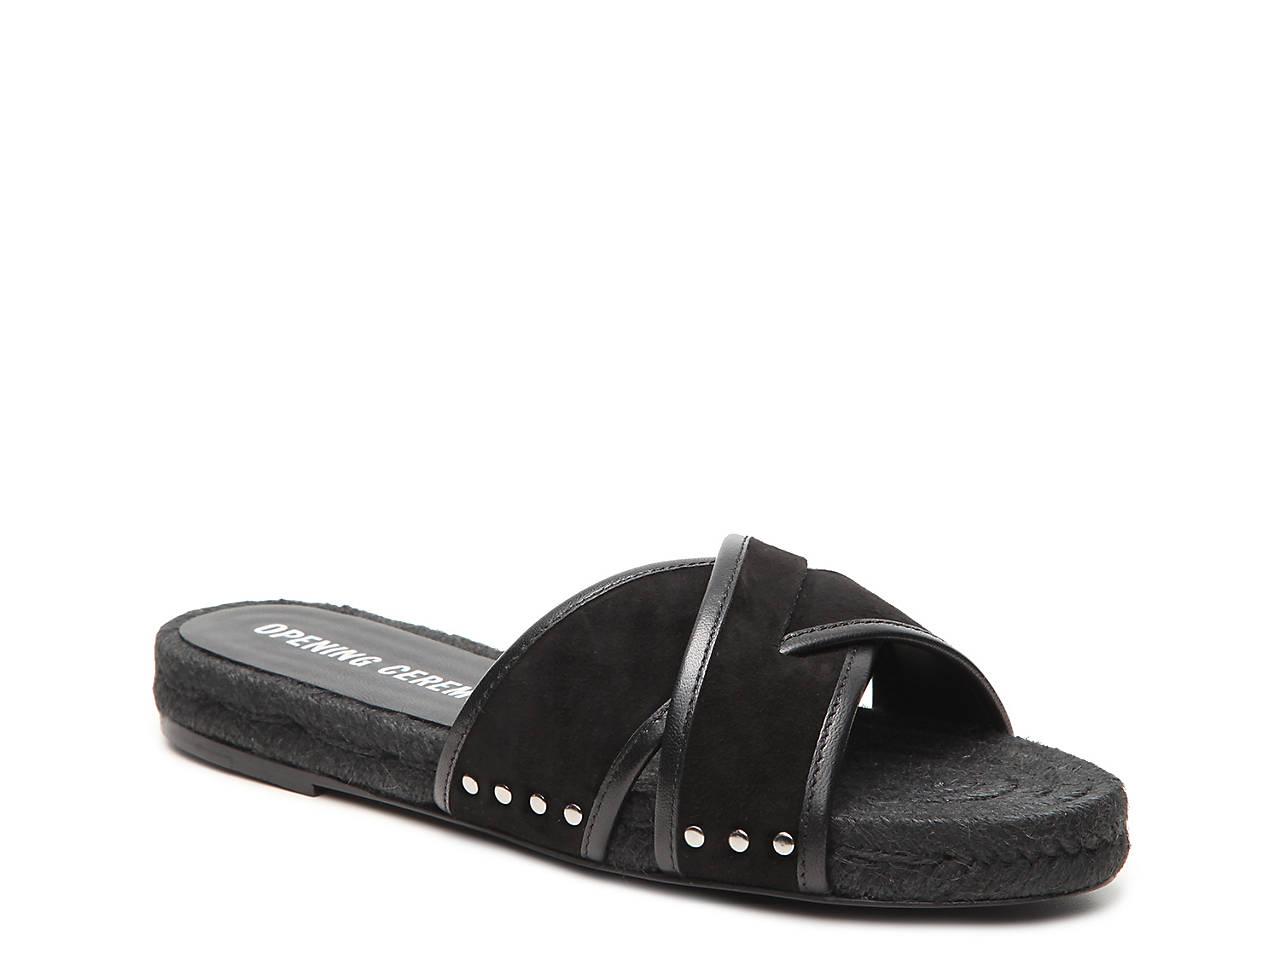 Opening Ceremony Slide Espadrille Sandals Free Shipping 100% Original 2018 Unisex Sale Online eNm22